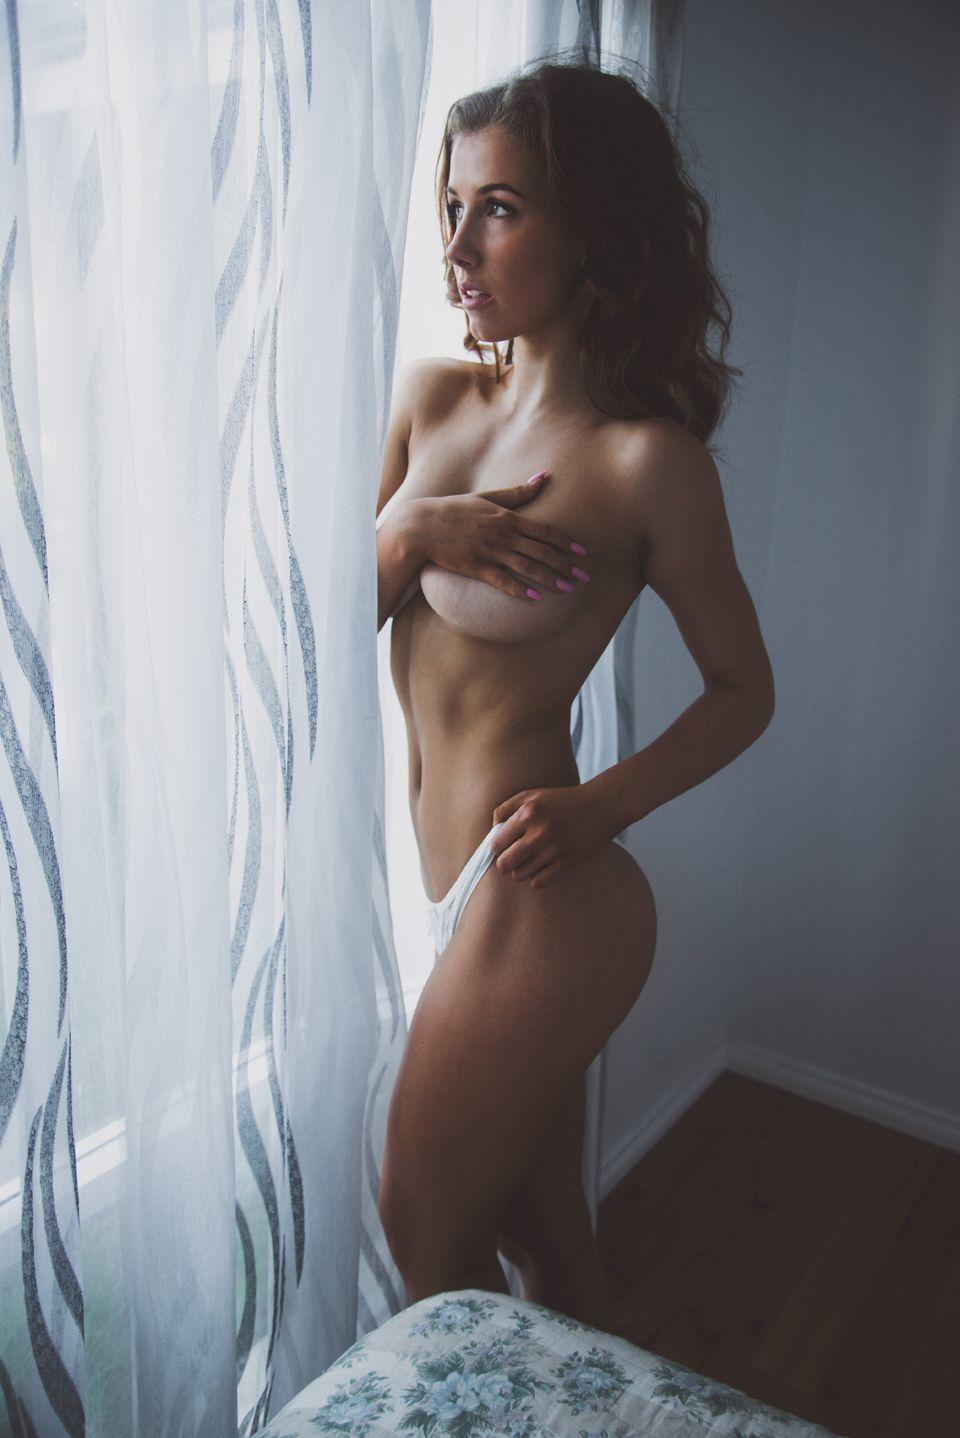 susan-muhling-sexy-1